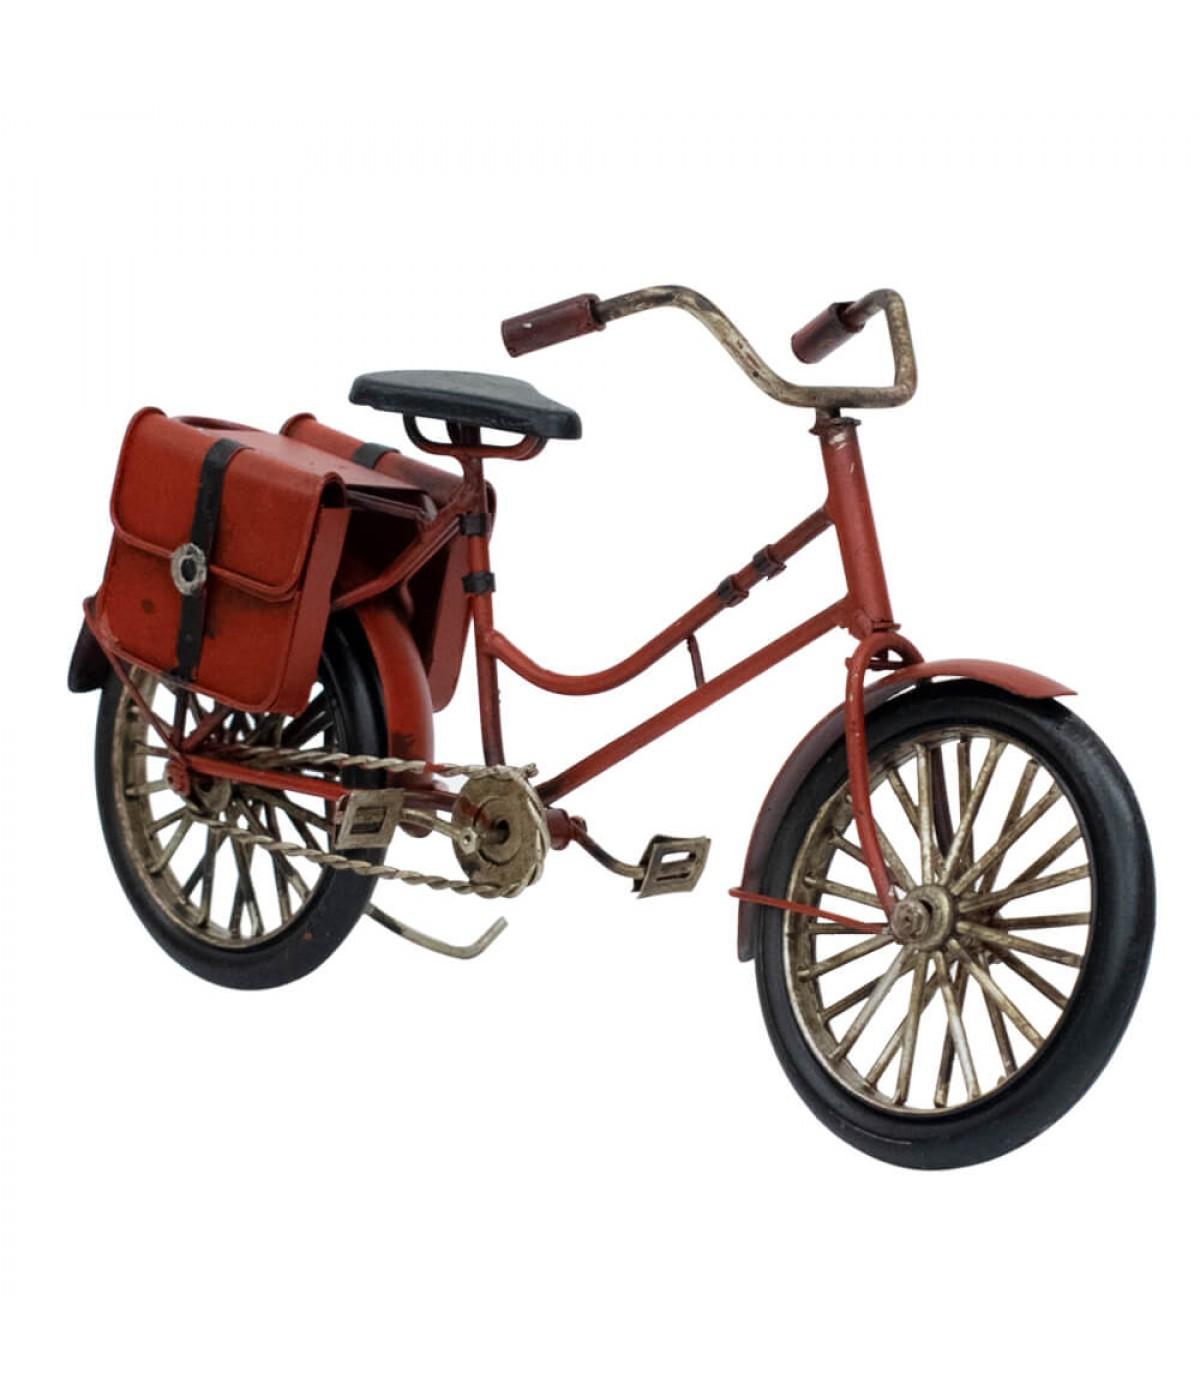 Bicicleta Vermelha 12.5x23.2x9cm Estilo Retrô - Vintage